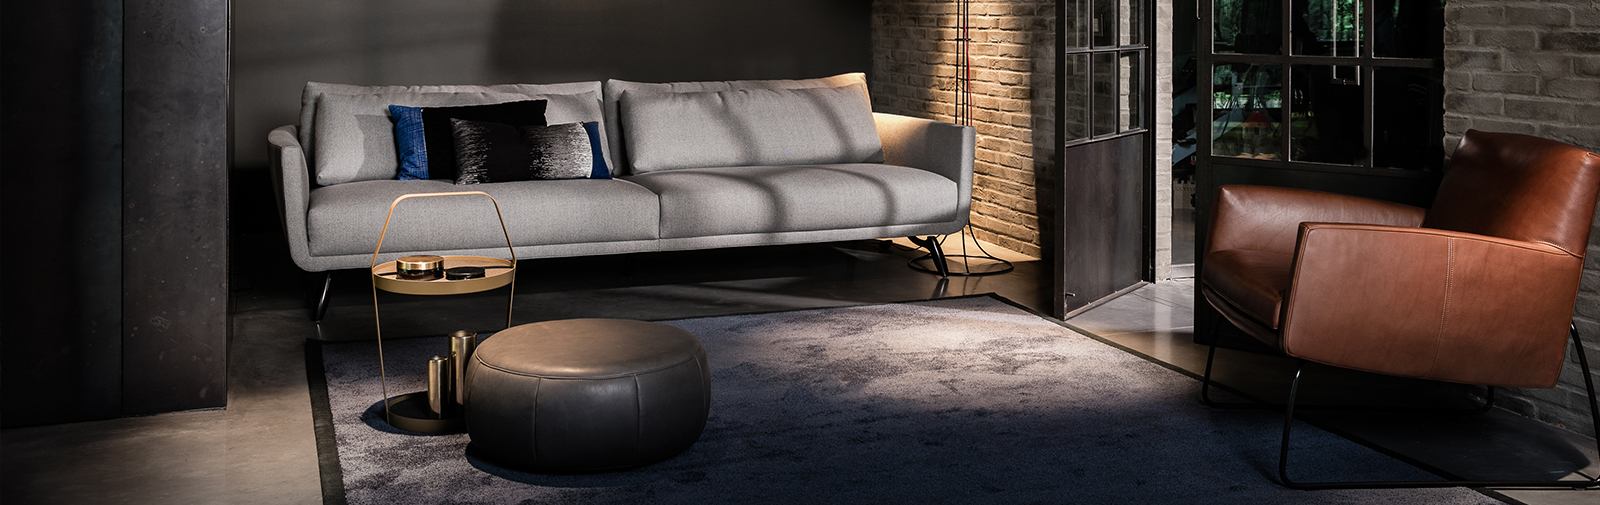 Design On Stock Bank.Bank Byen Lounge Design On Stock Interieurhof Alkmaar